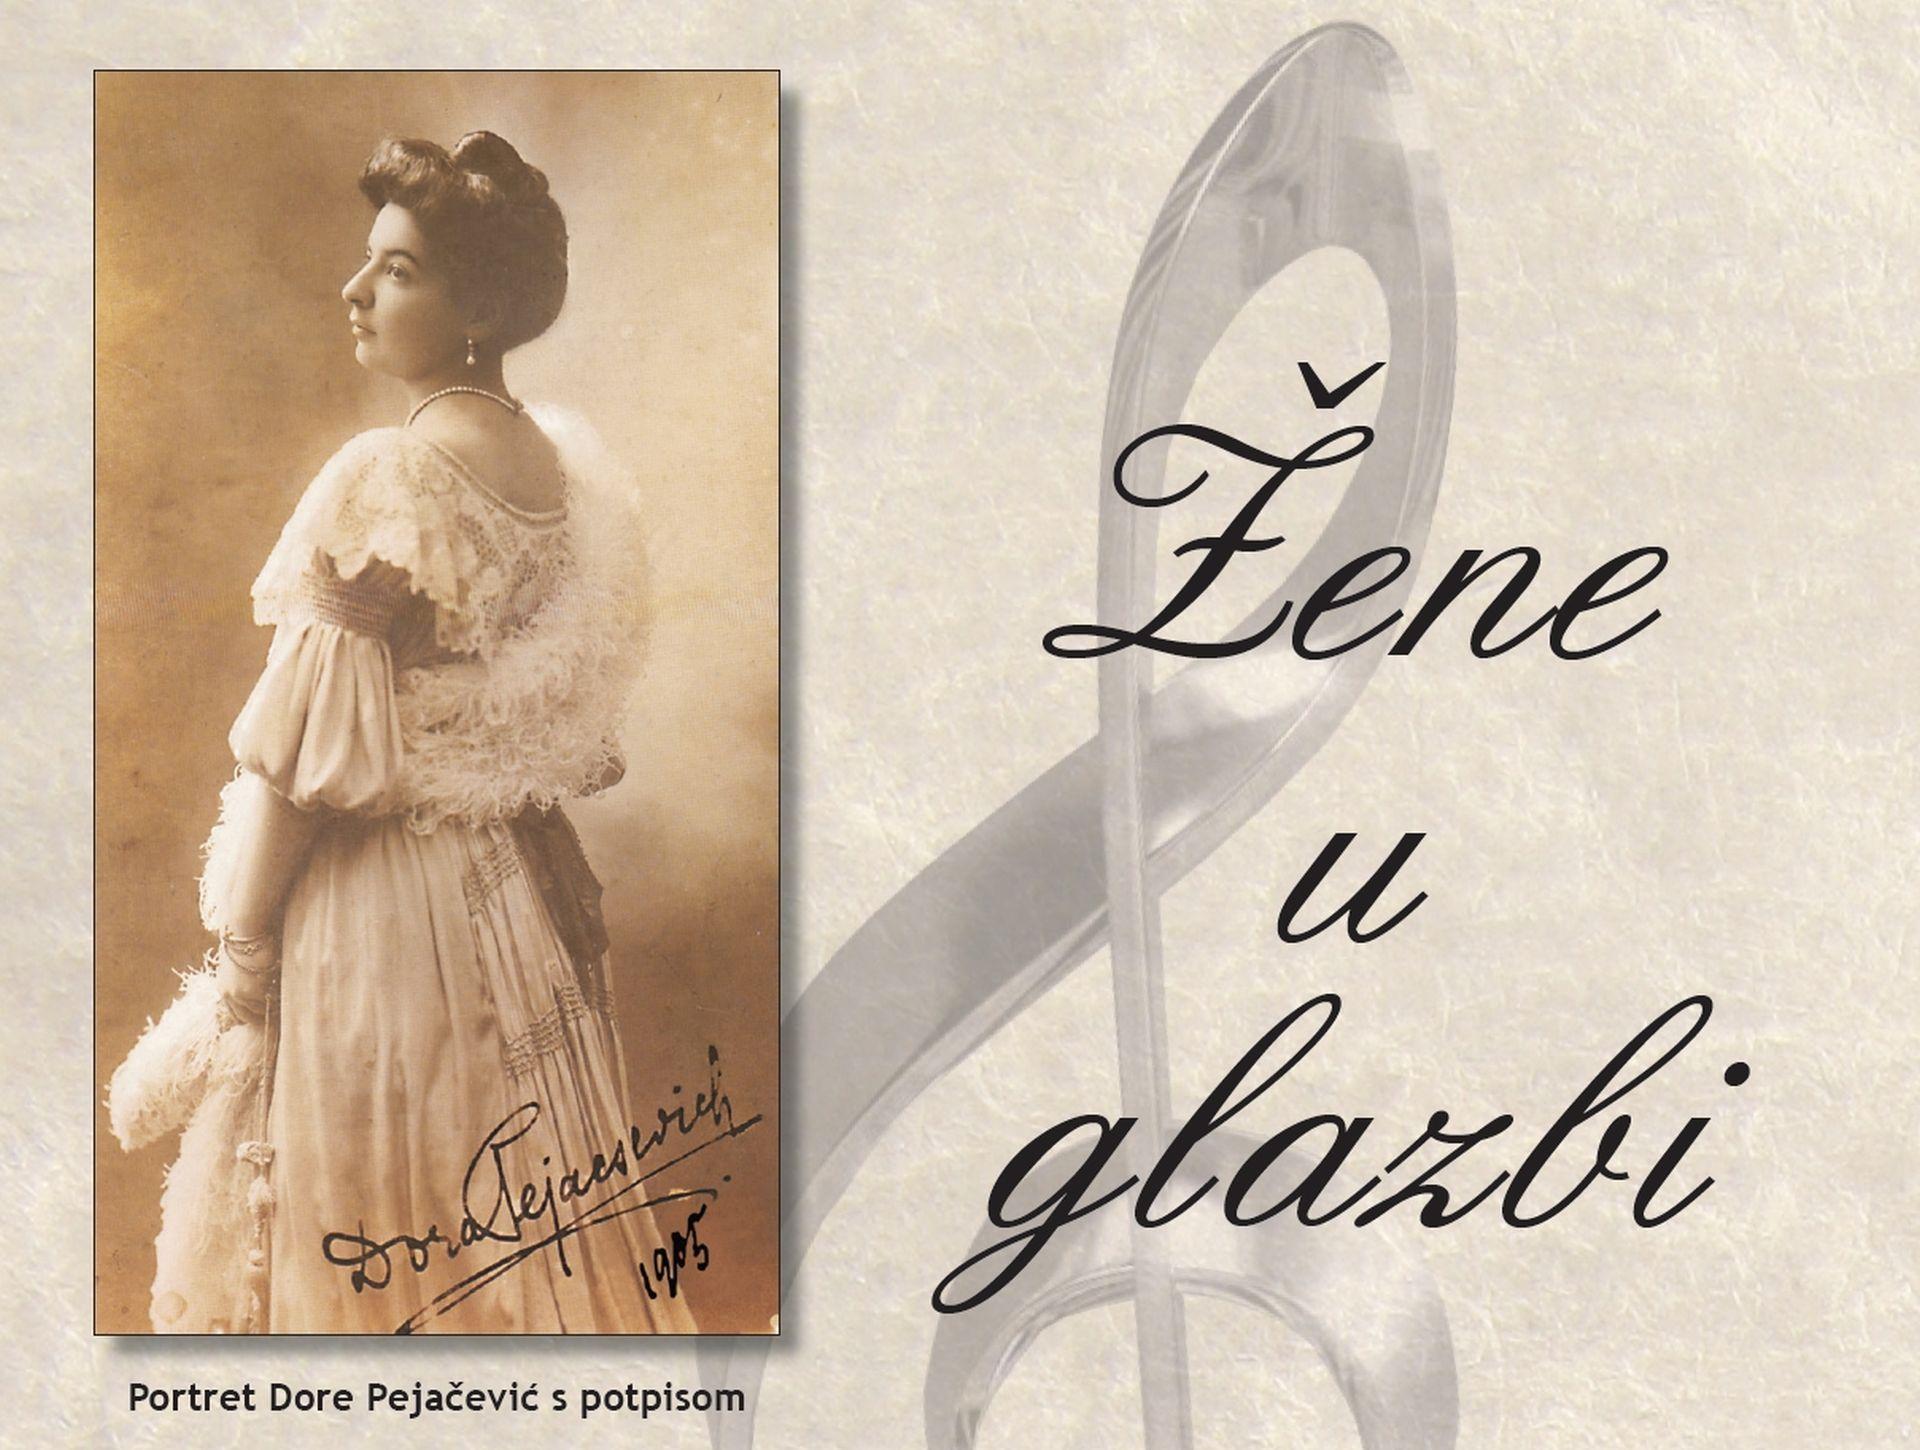 ŽENE U GLAZBI Koncerti povodom 95. obljetnice smrti Dore Pejačević